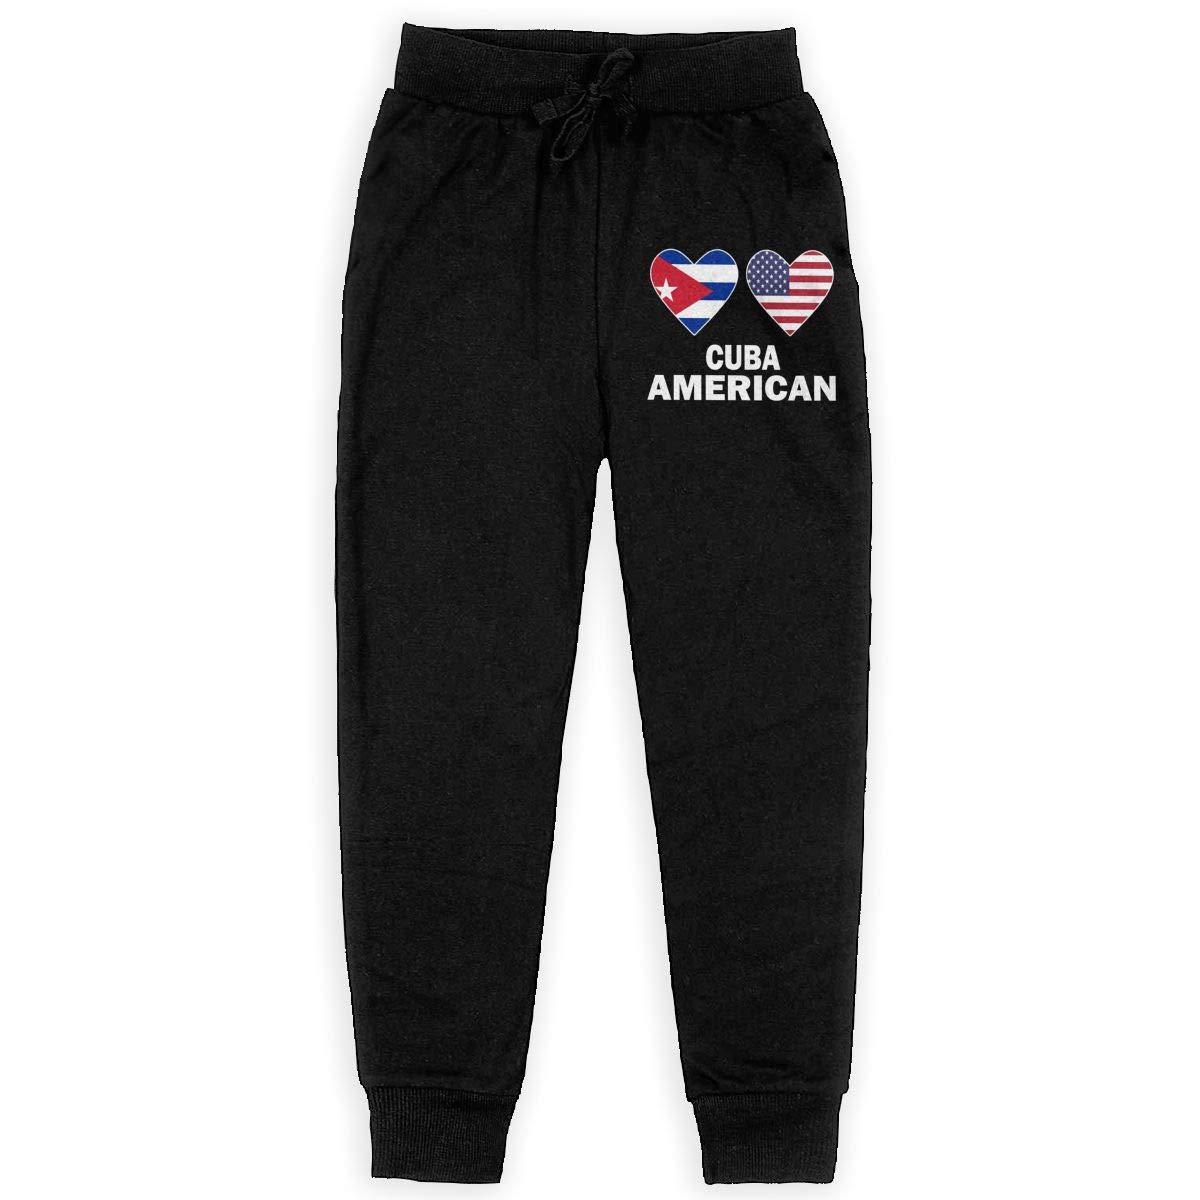 WYZVK22 Cuba American Hearts Soft//Cozy Sweatpants Youth Fleece Pants for Teen Boy